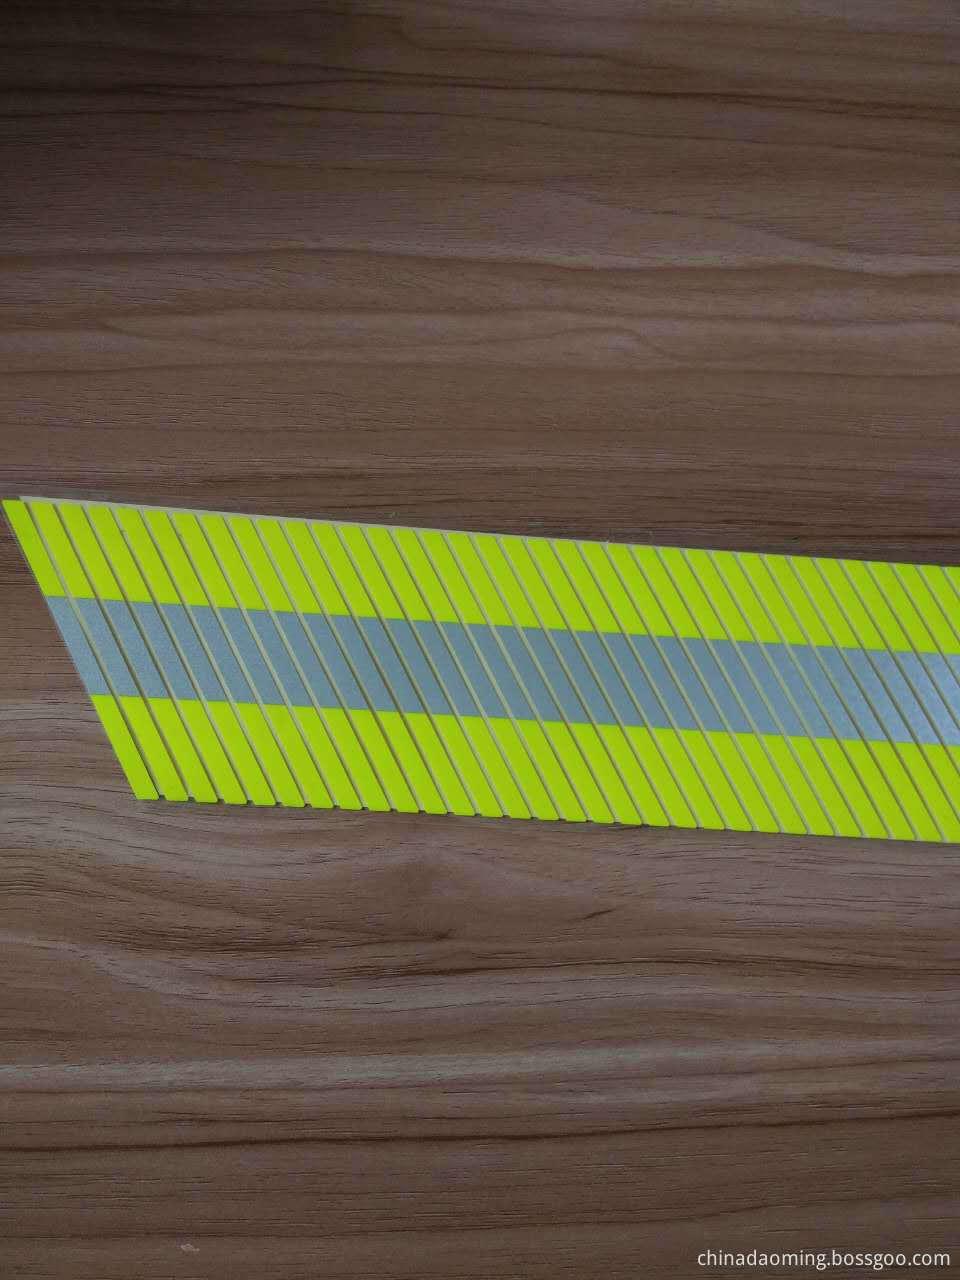 D1995 Flame Retardant Segmented Reflective Tape